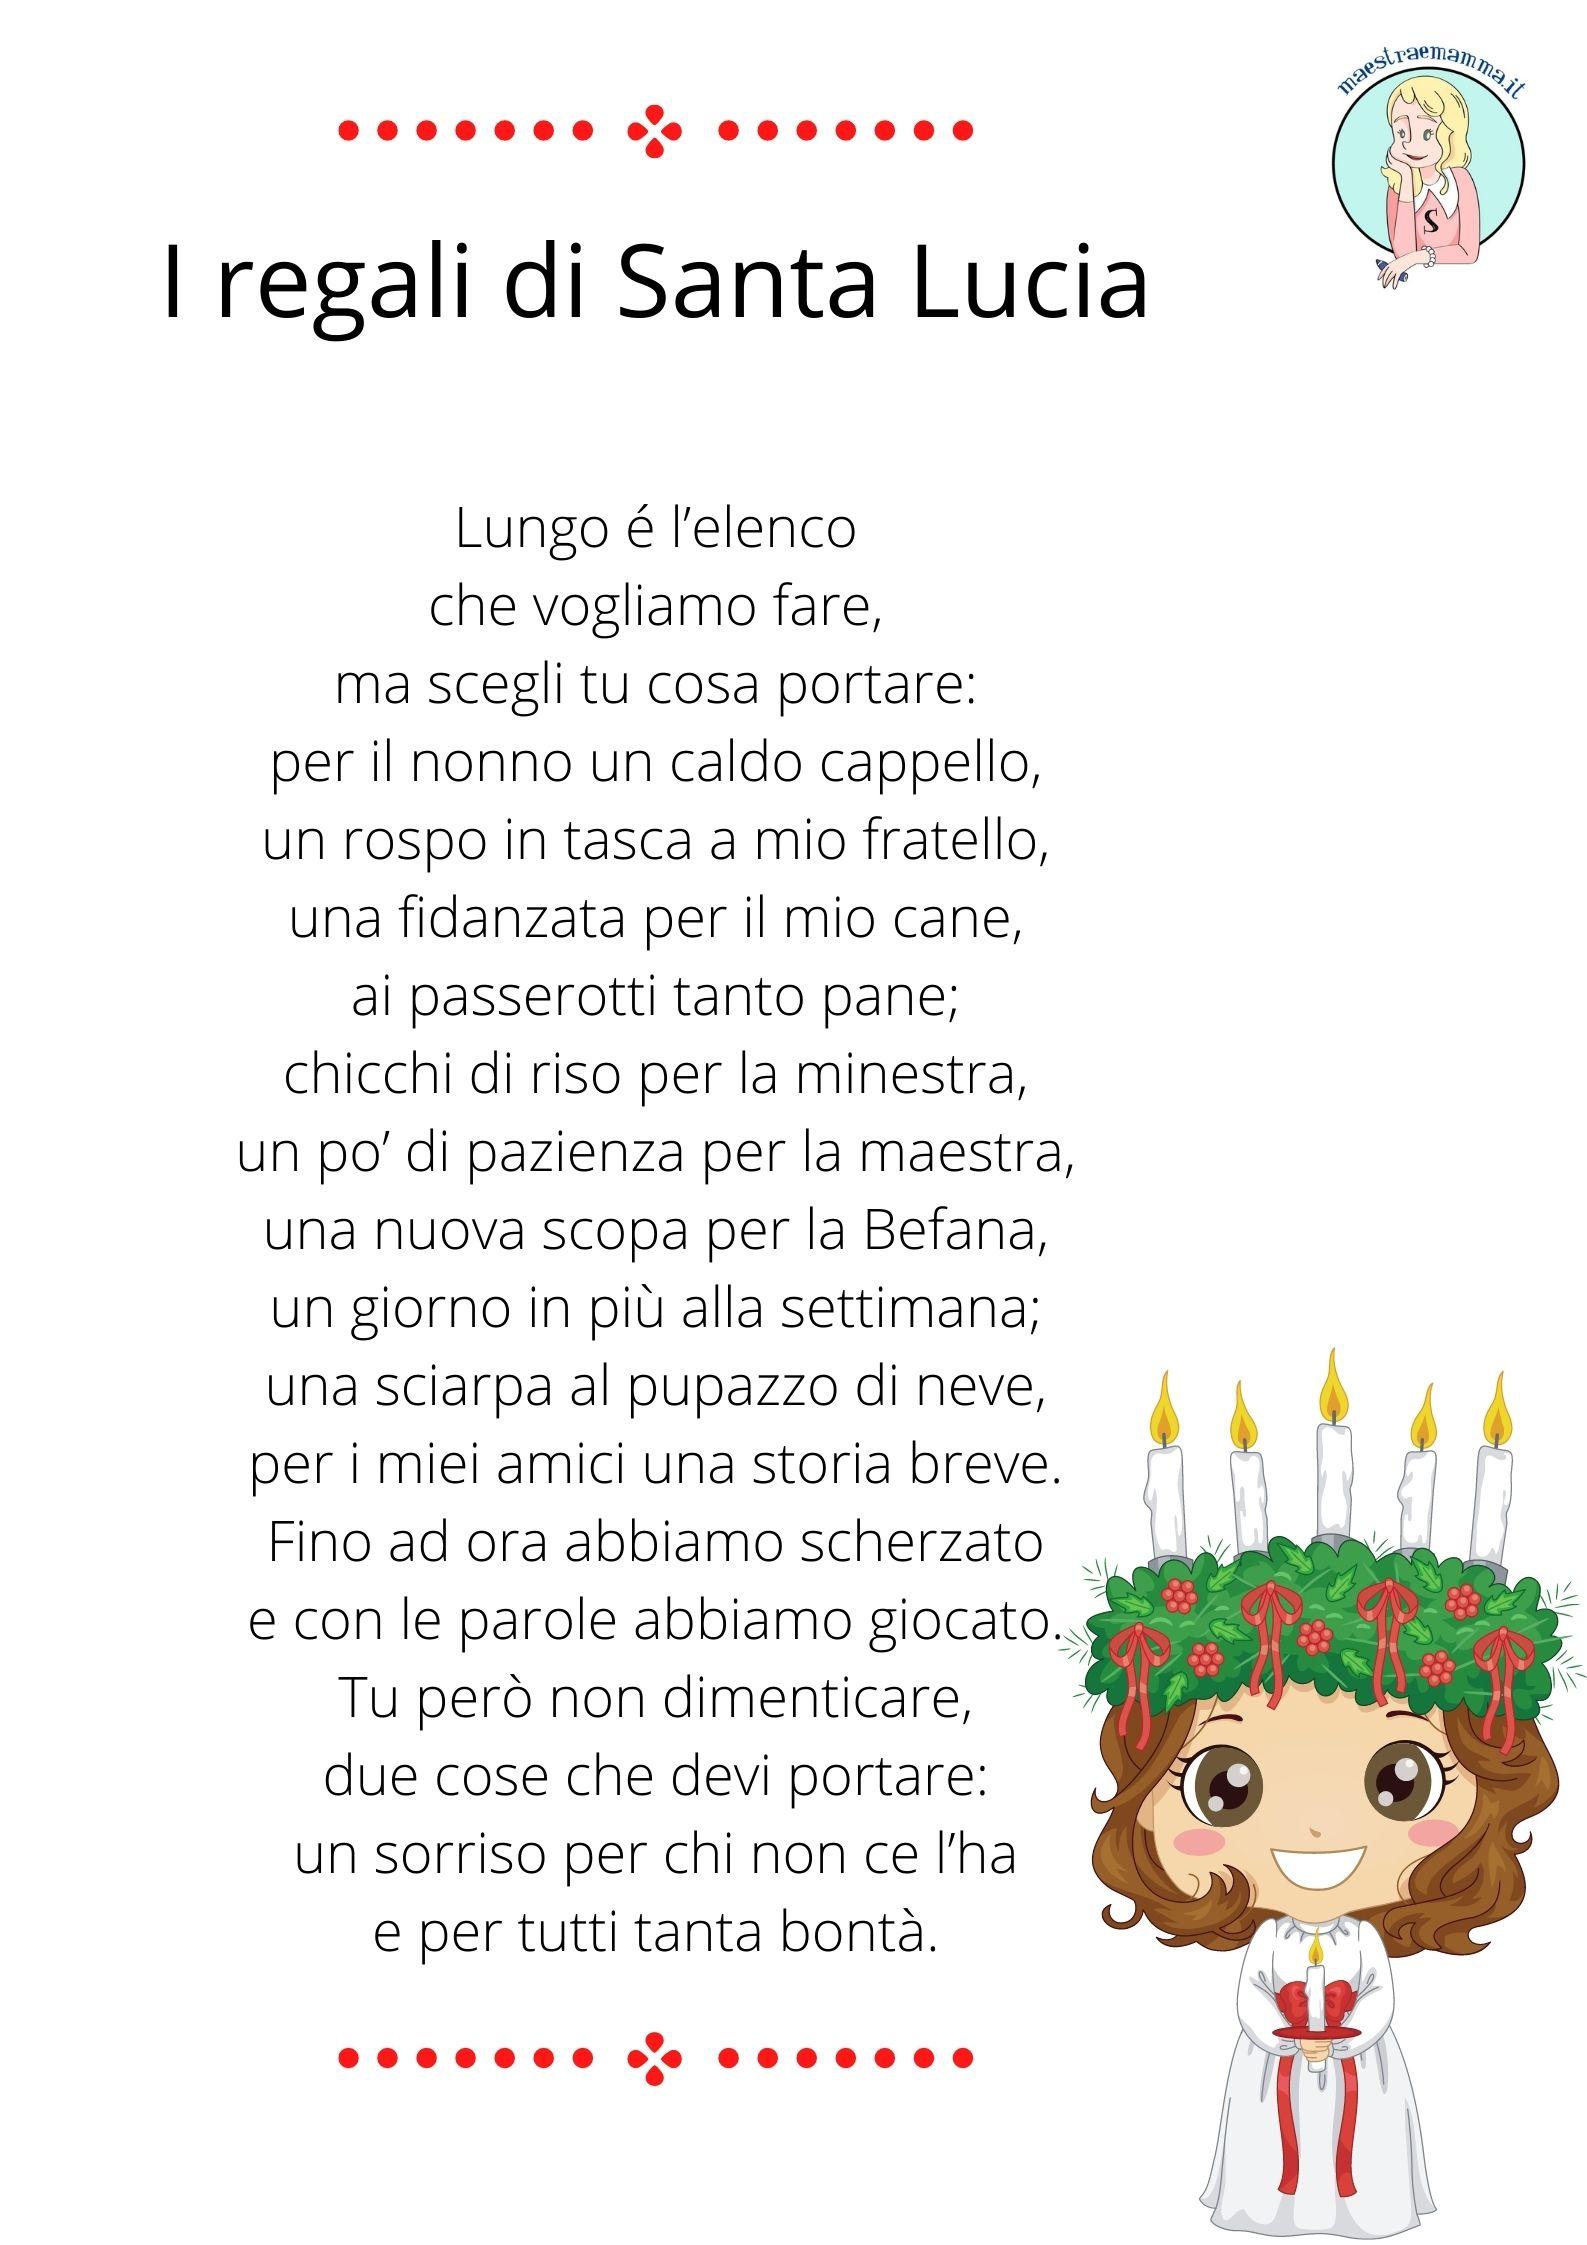 I regali di Santa Lucia (poesia)